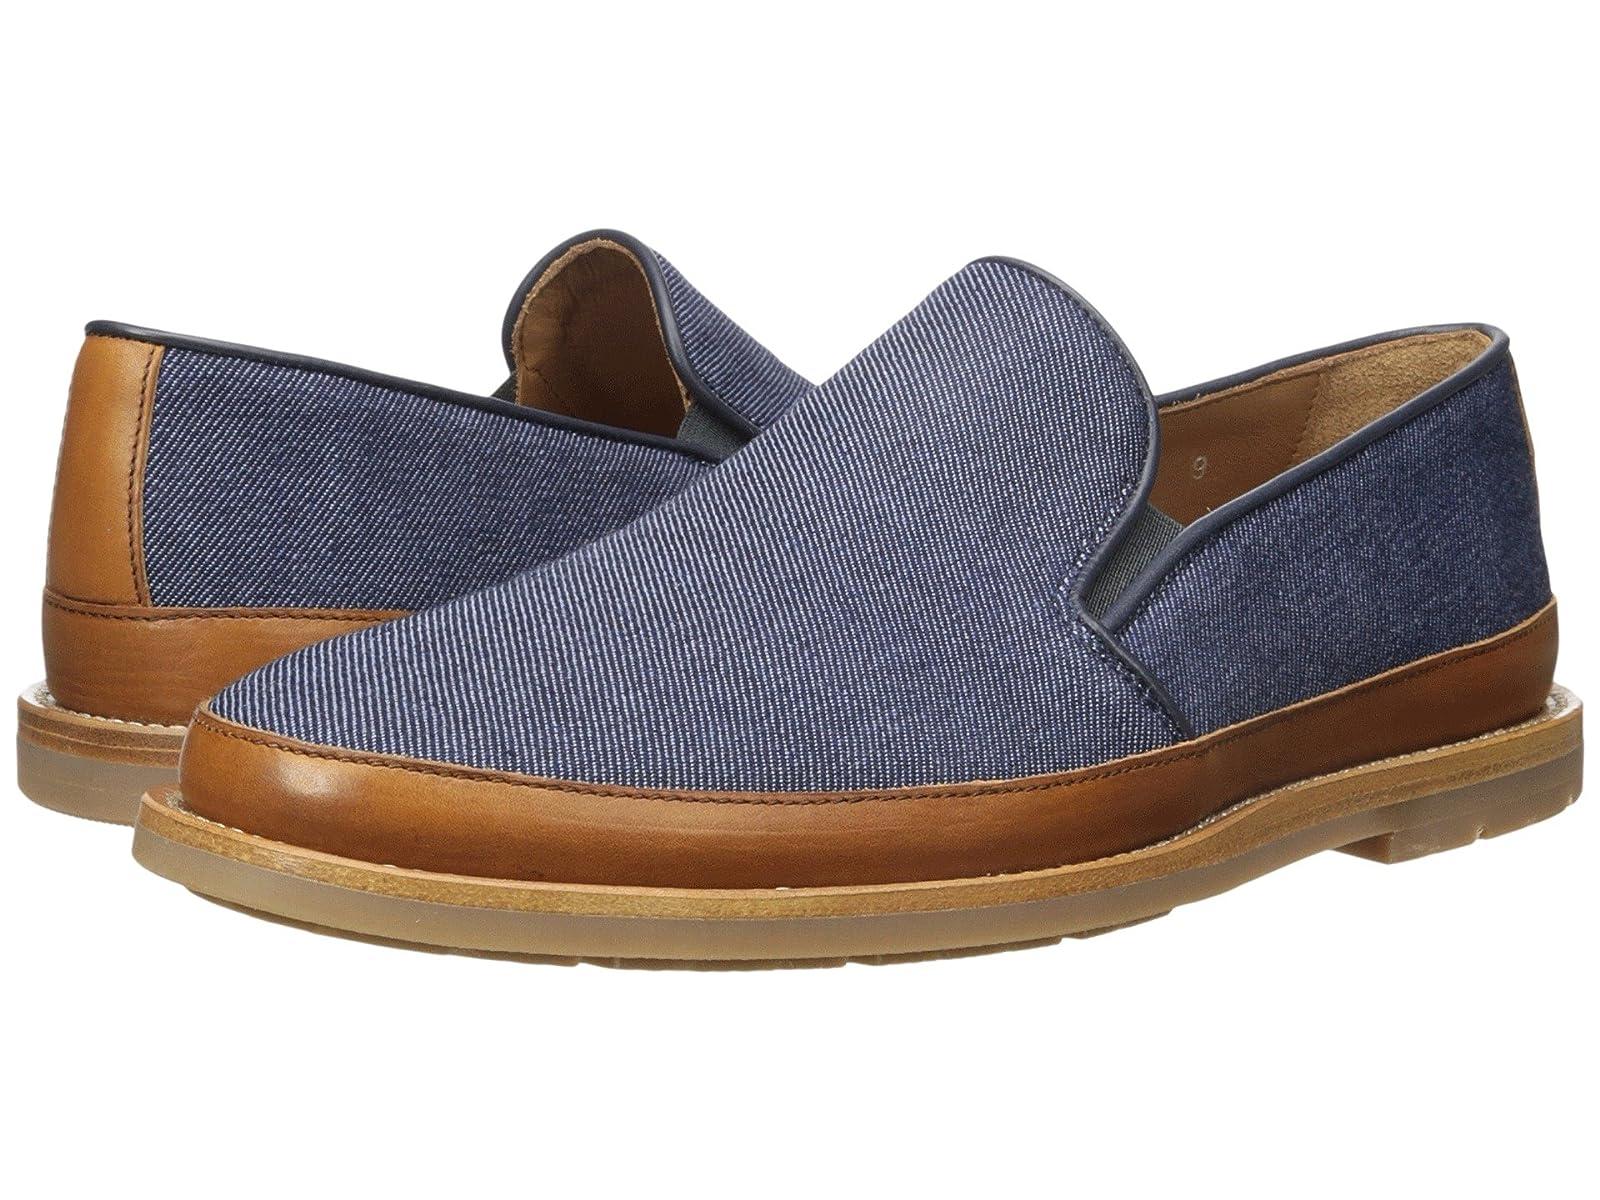 Aquatalia ZaynCheap and distinctive eye-catching shoes